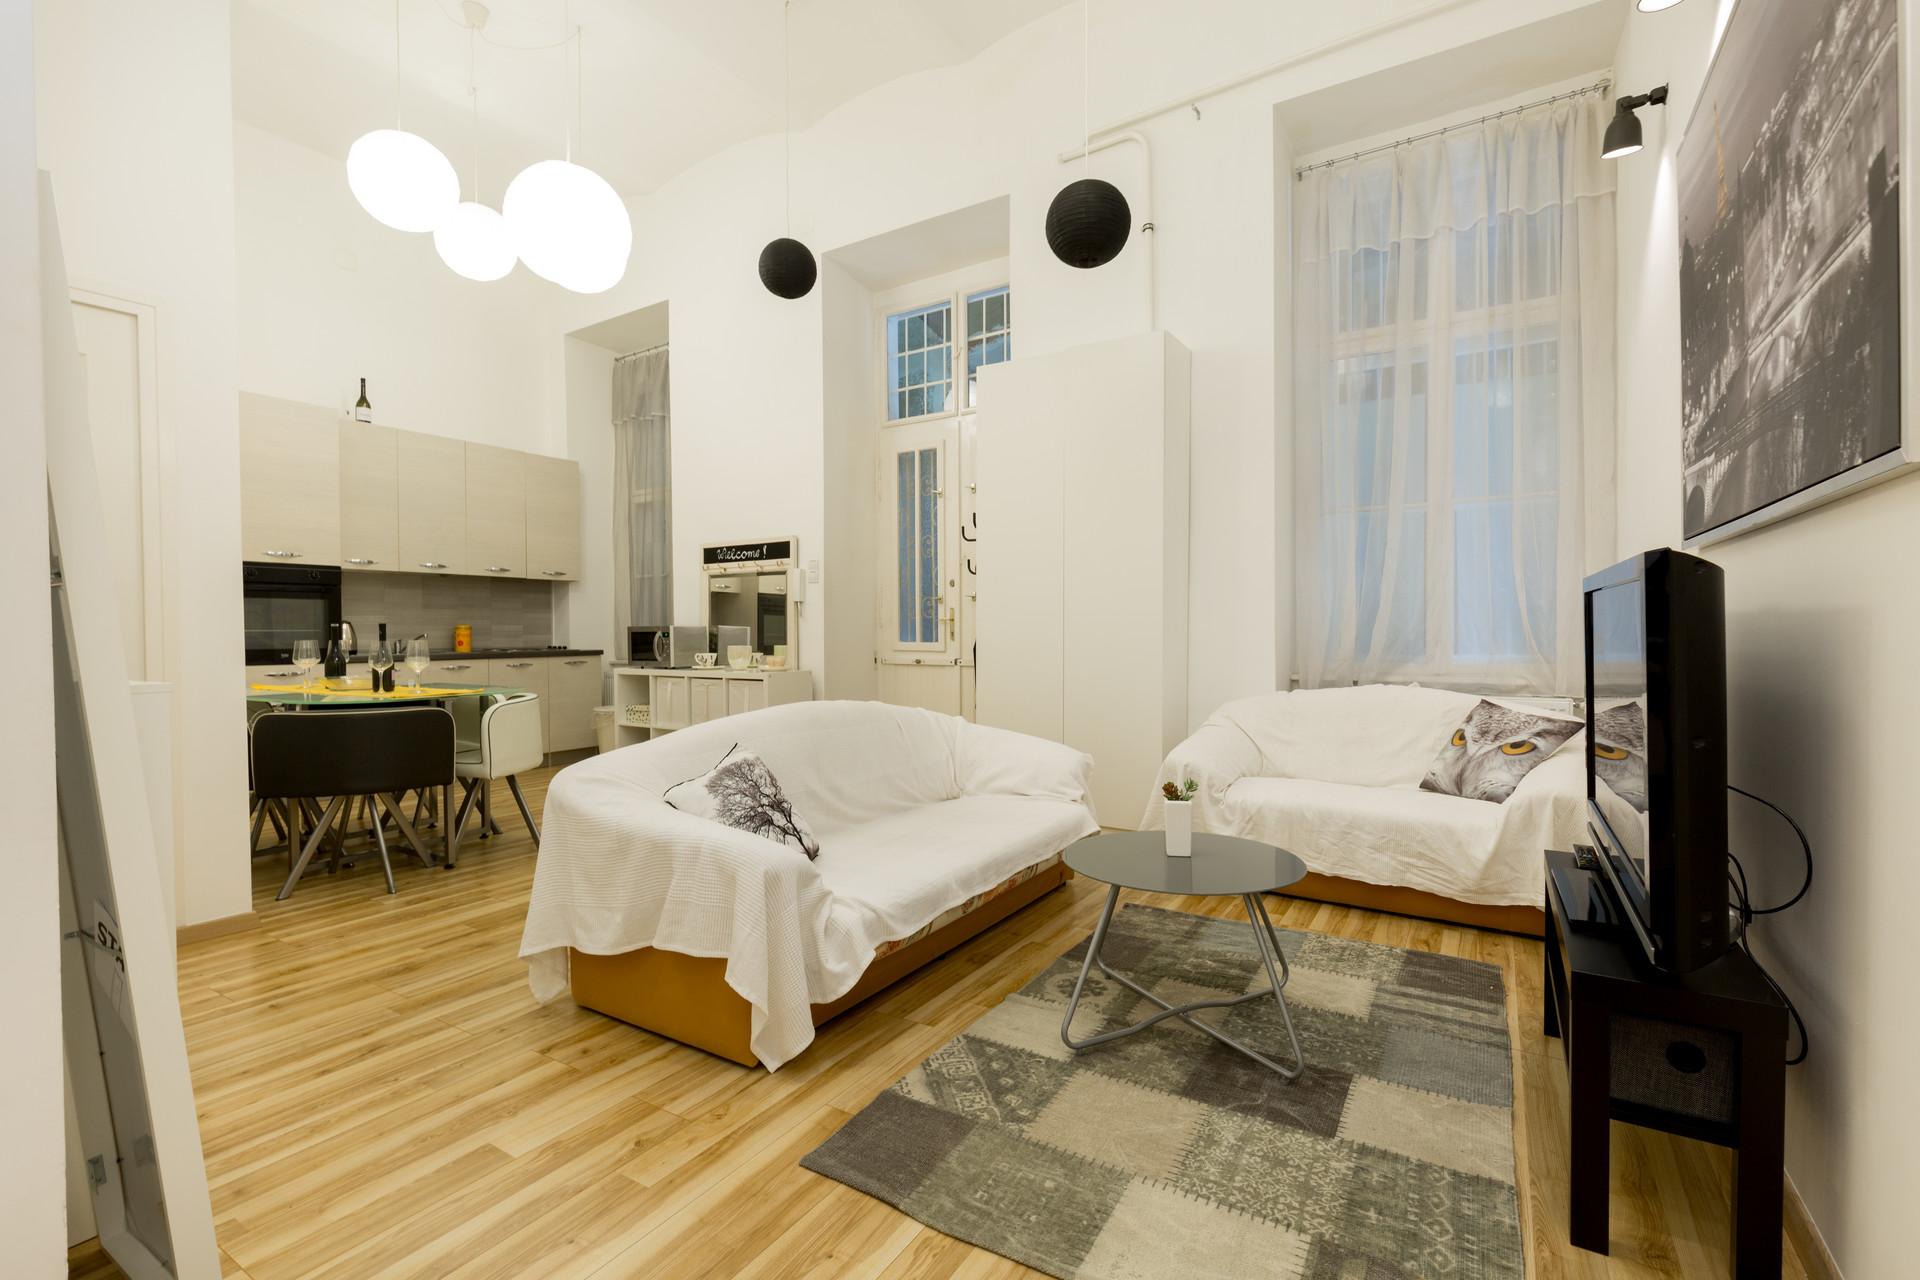 3 Bedroom 2 Bathroom Apt For Three Students On Andrassy Str